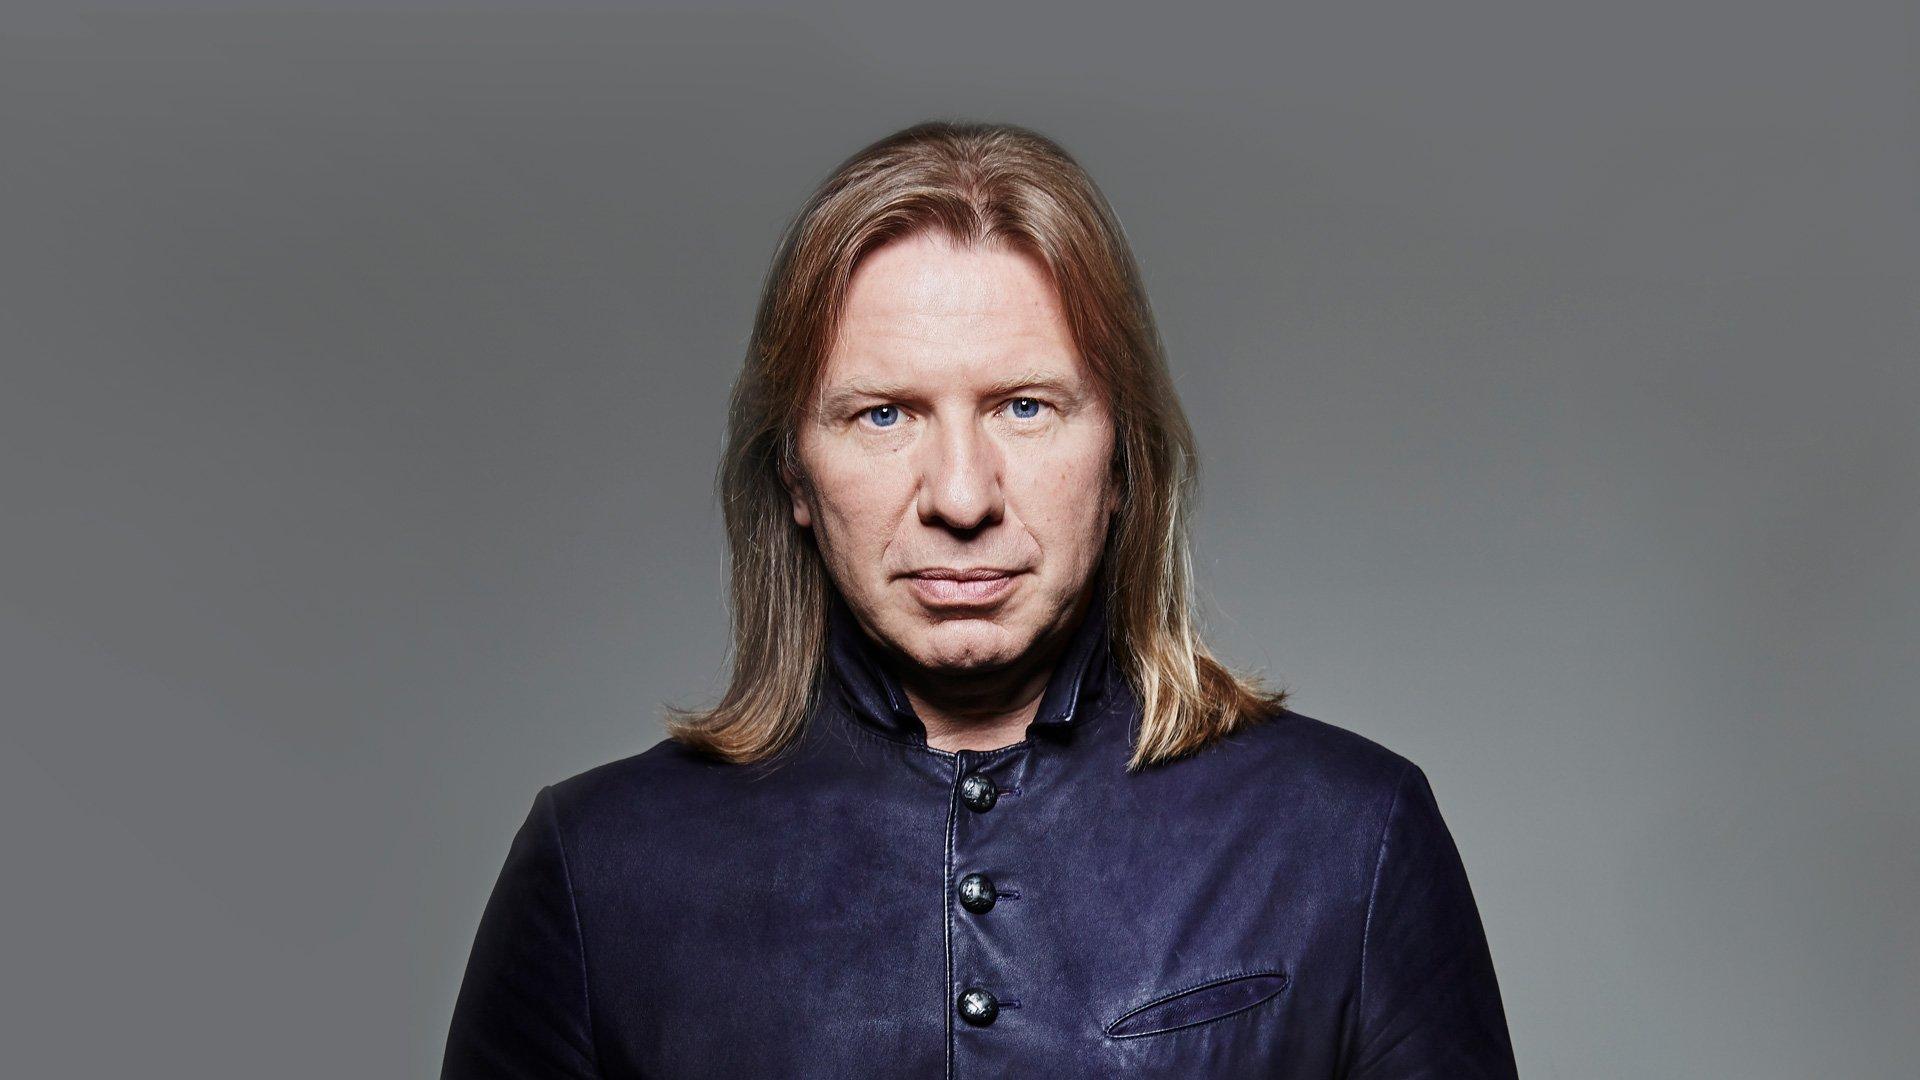 Виктор Дробыш госпитализирован